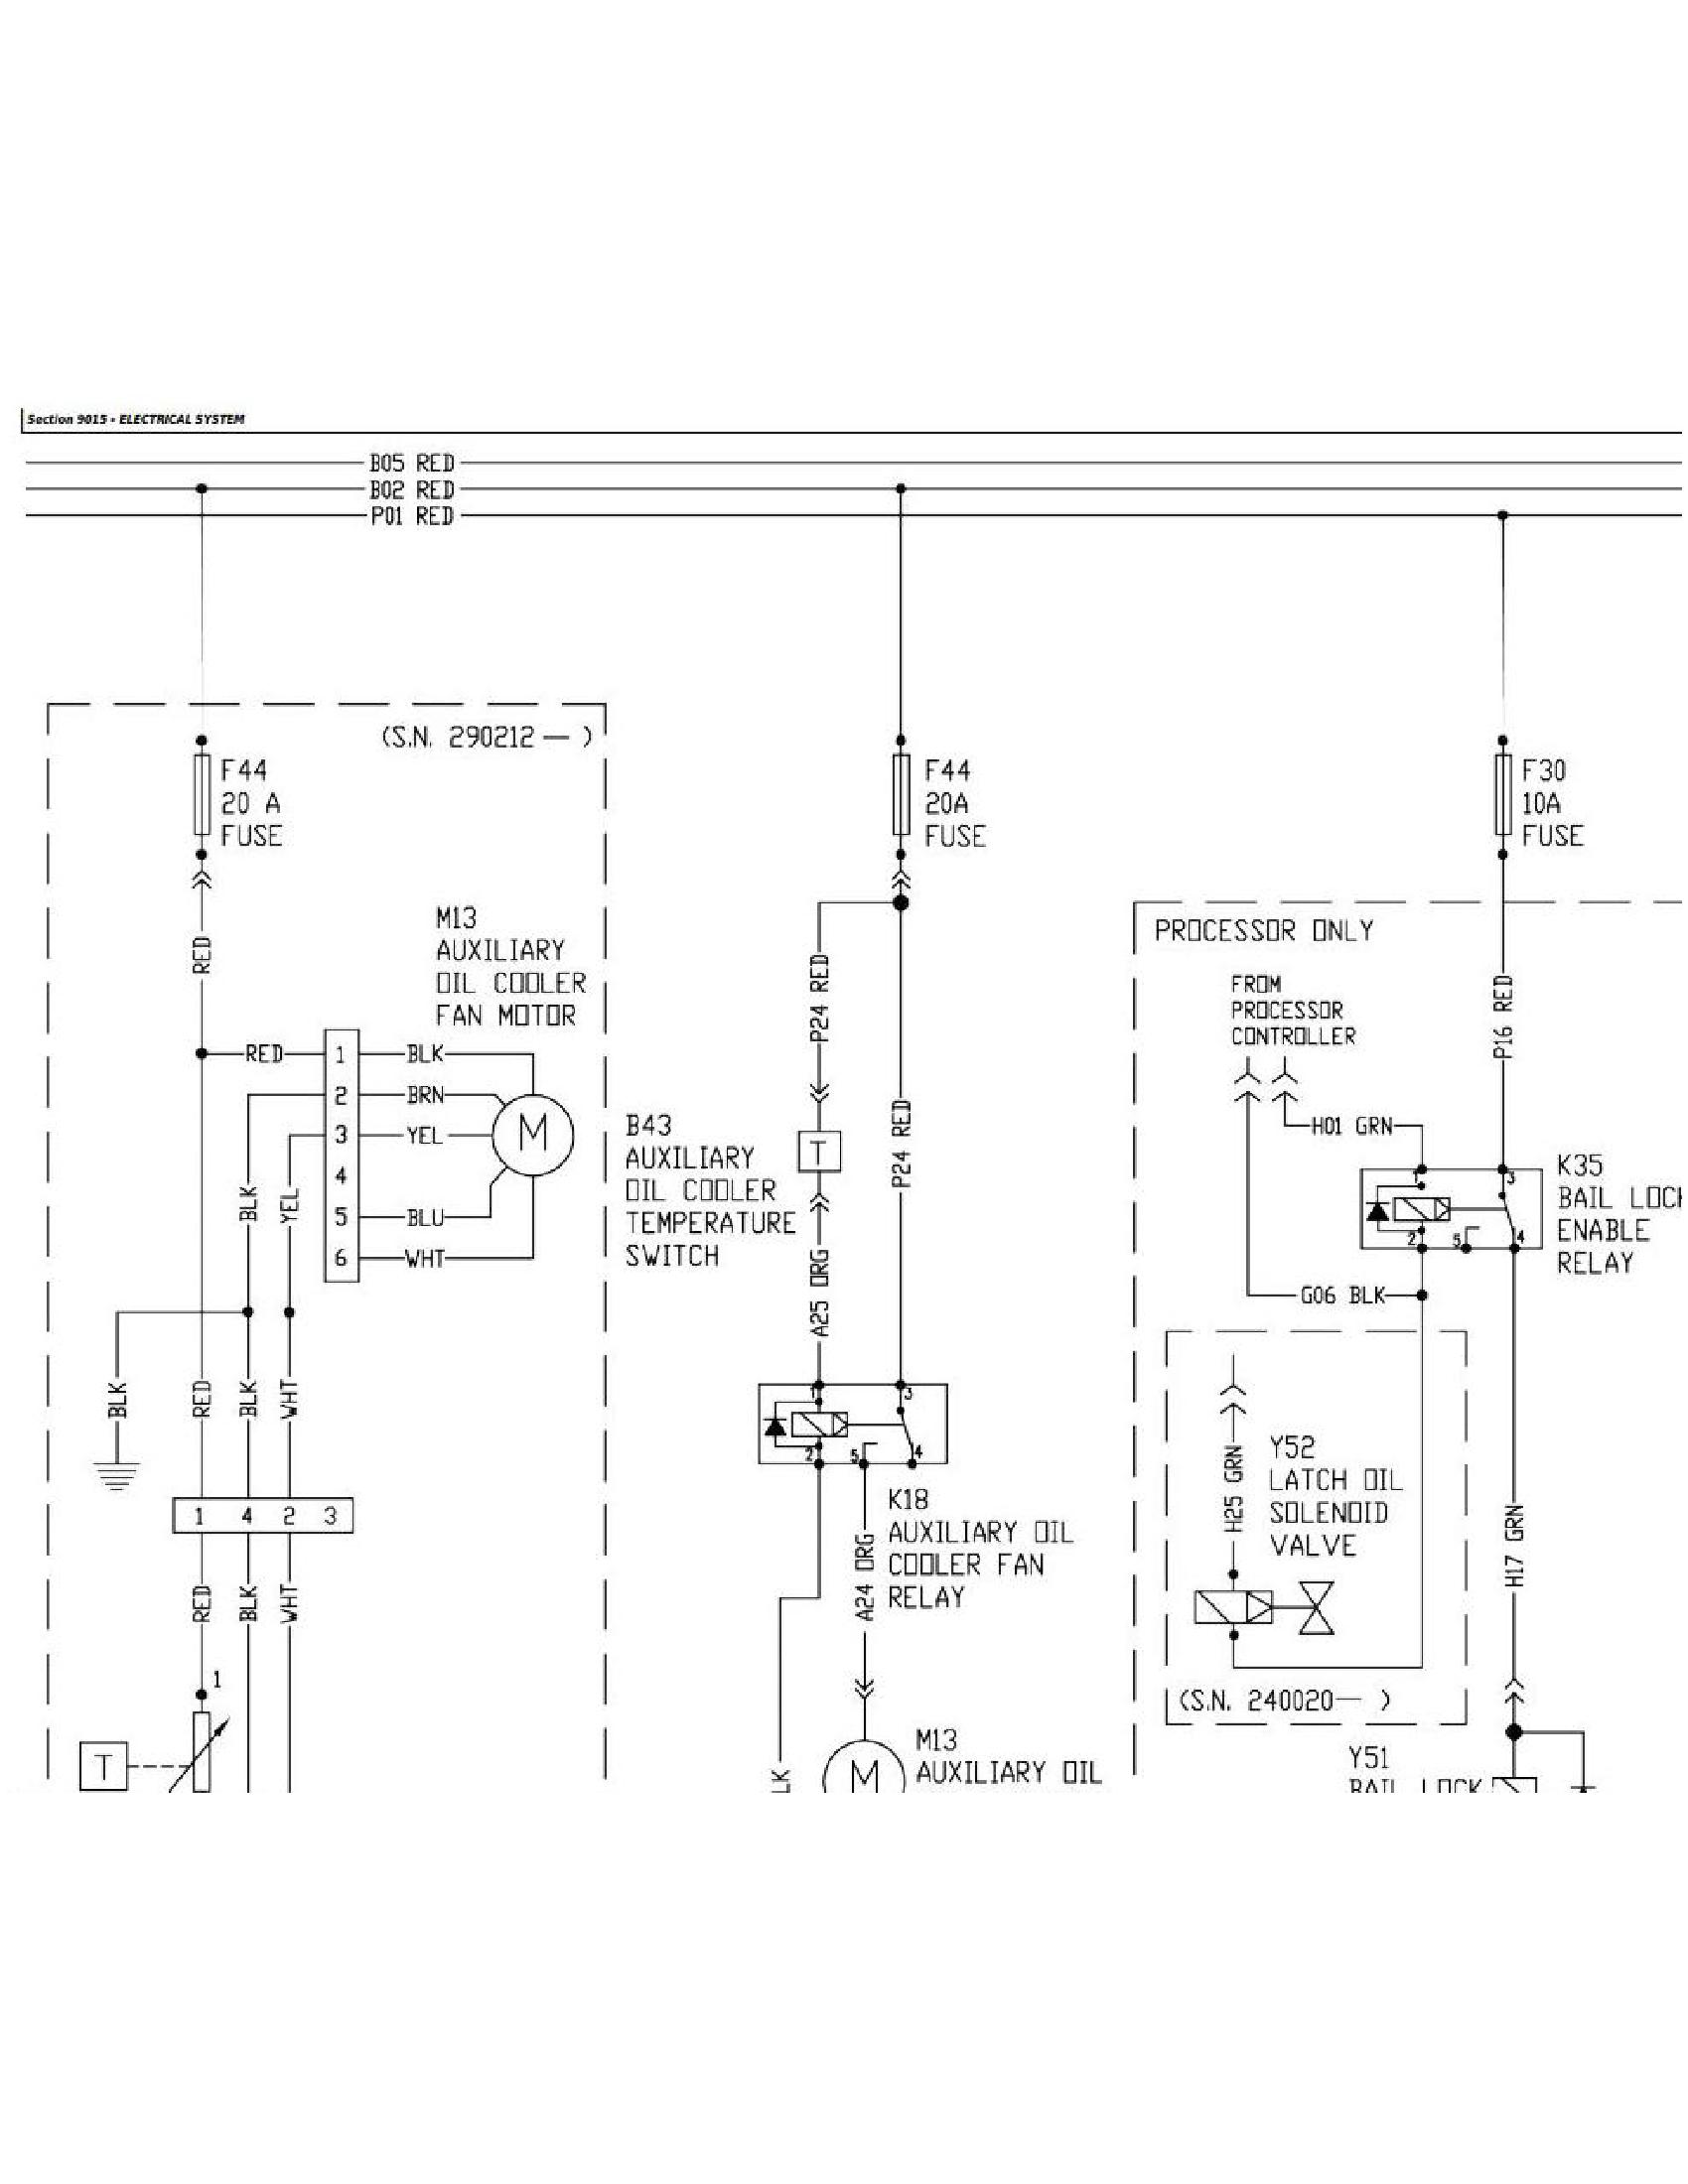 John Deere 2954D manual pdf